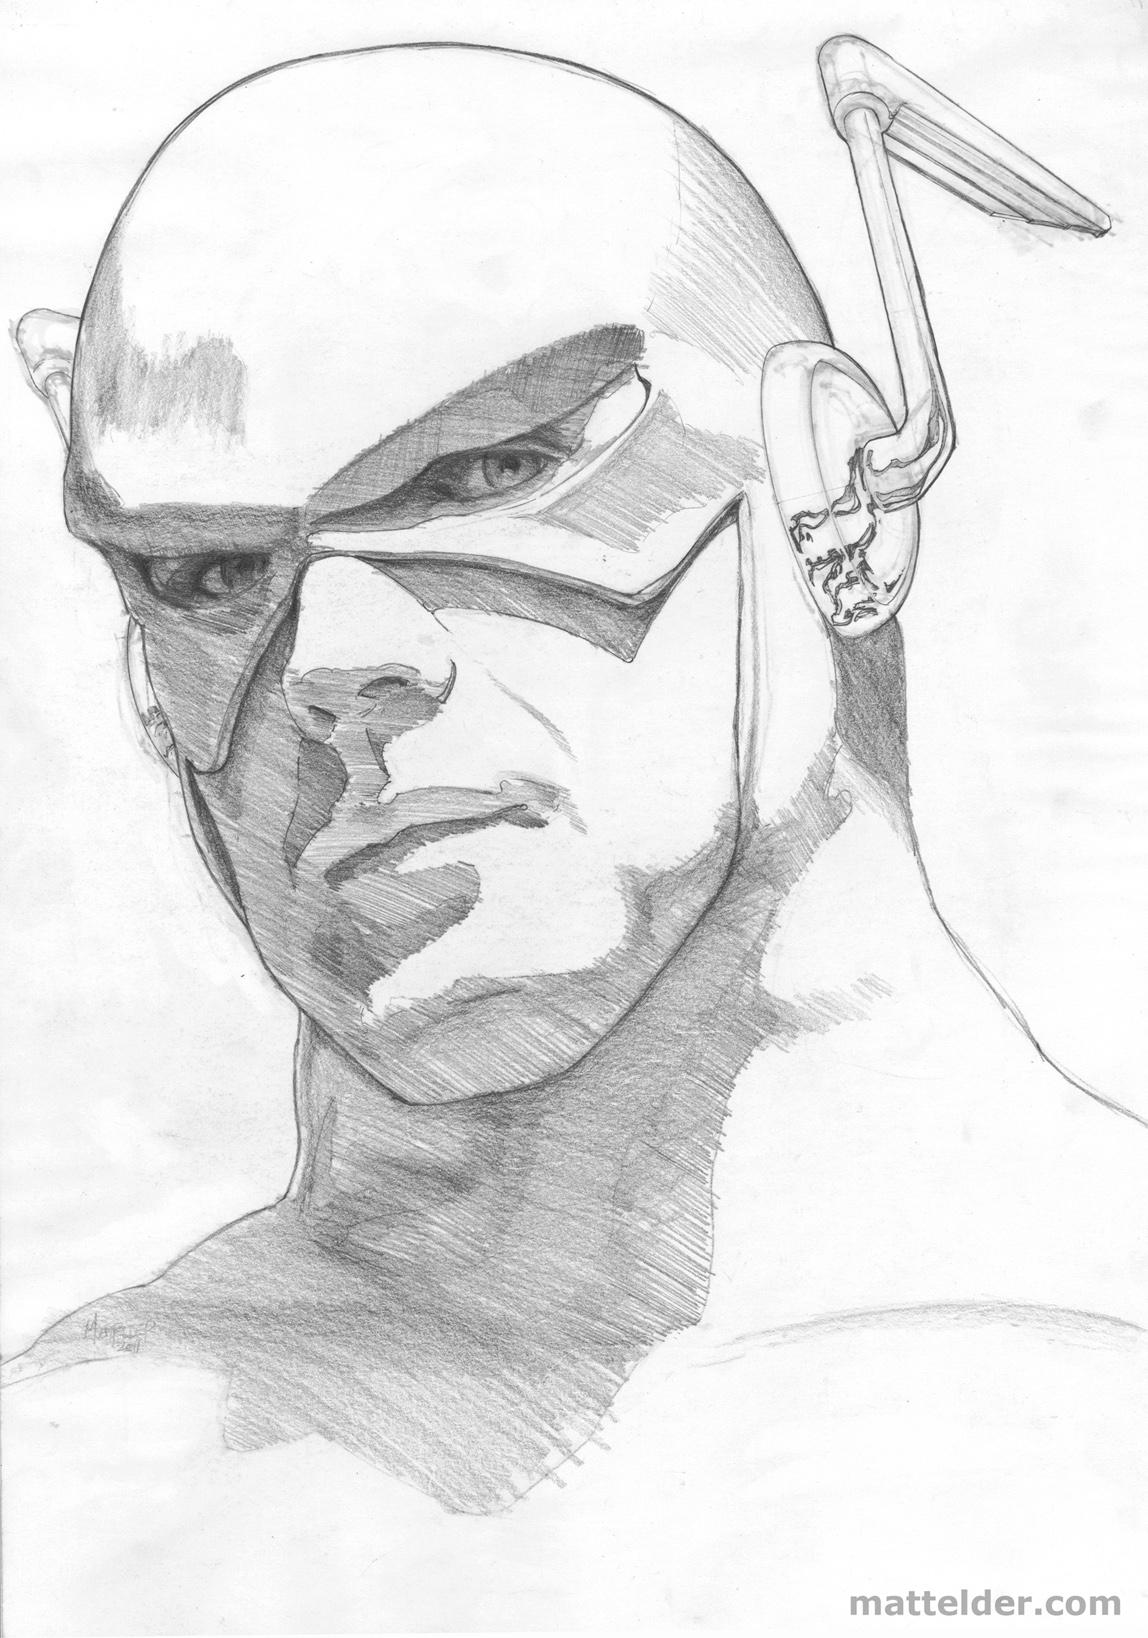 1148x1638 Sketches The Art Of Matt Elder